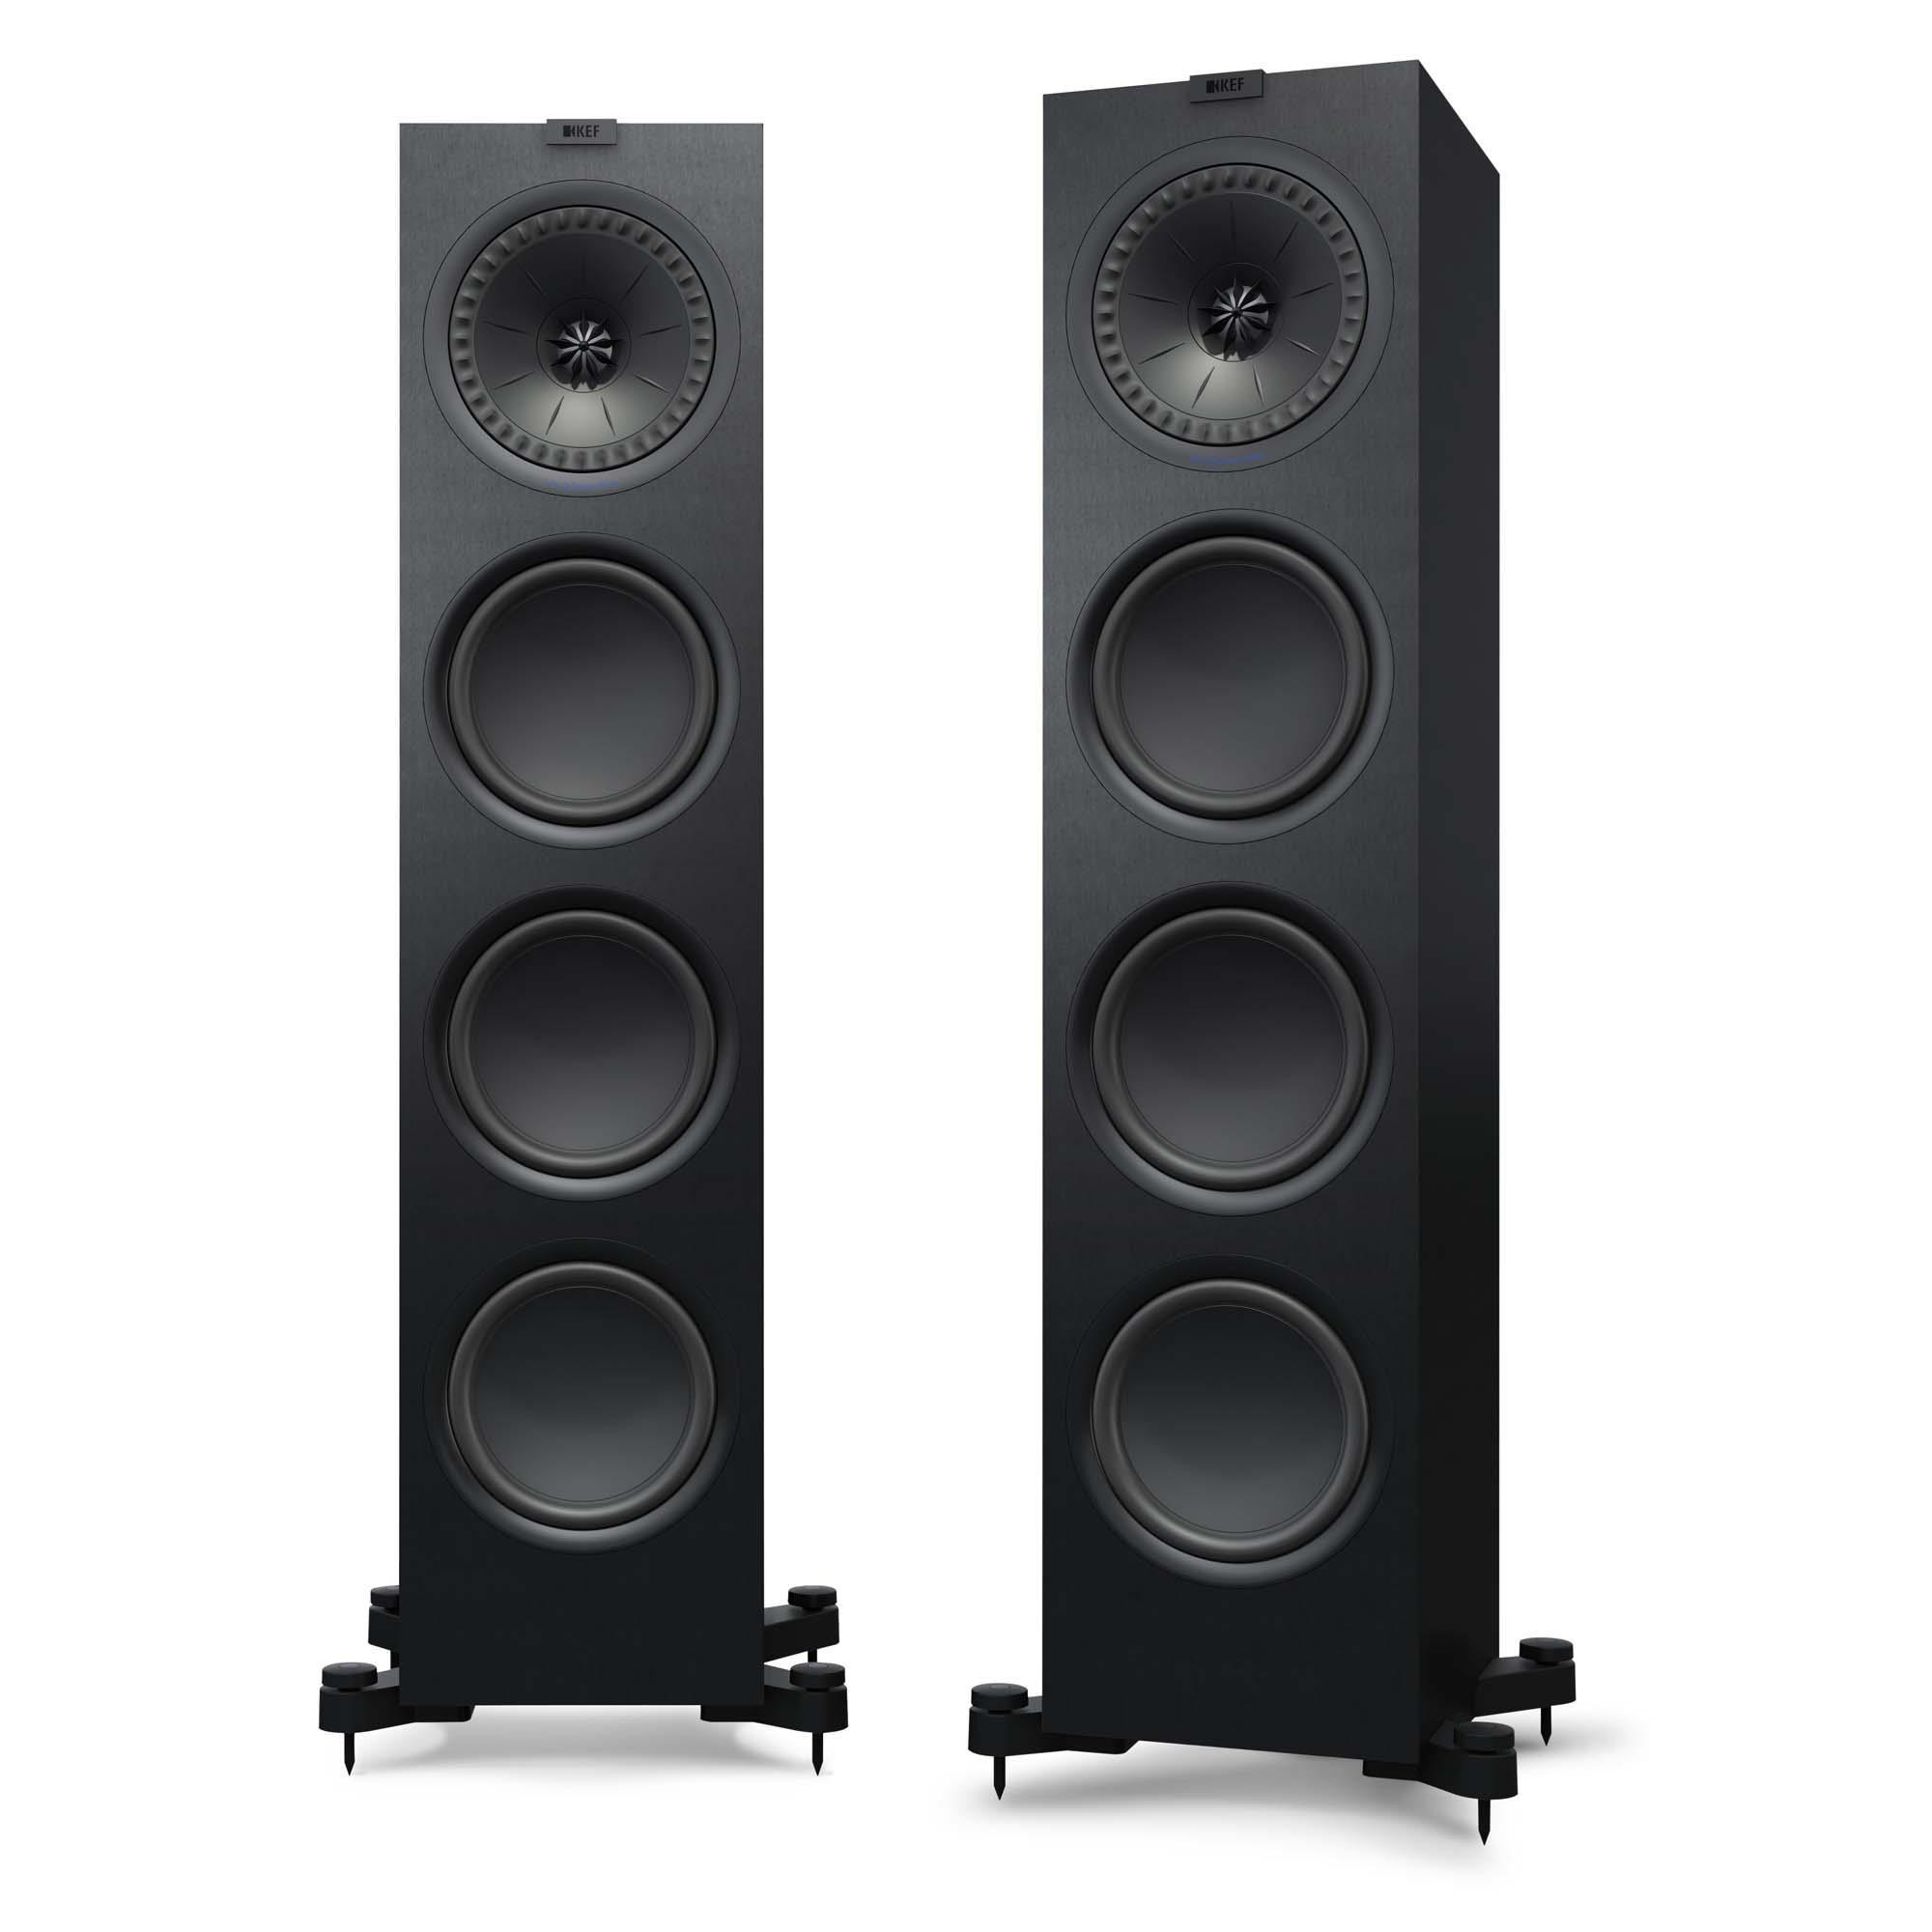 Sevenoaks Sound And Vision Kef Q950 Floorstanding Speakers